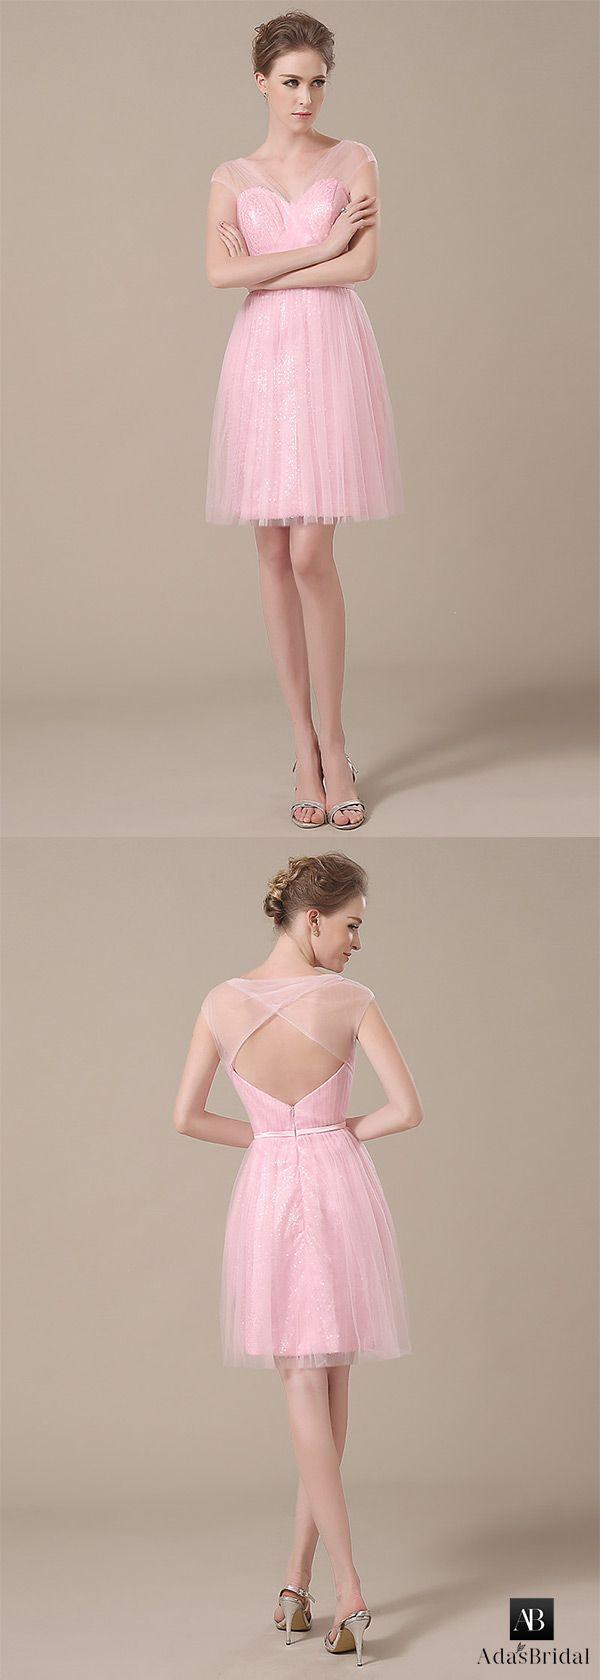 Mejores 124 imágenes de AdasBridal Bridesmaid Dresses en Pinterest